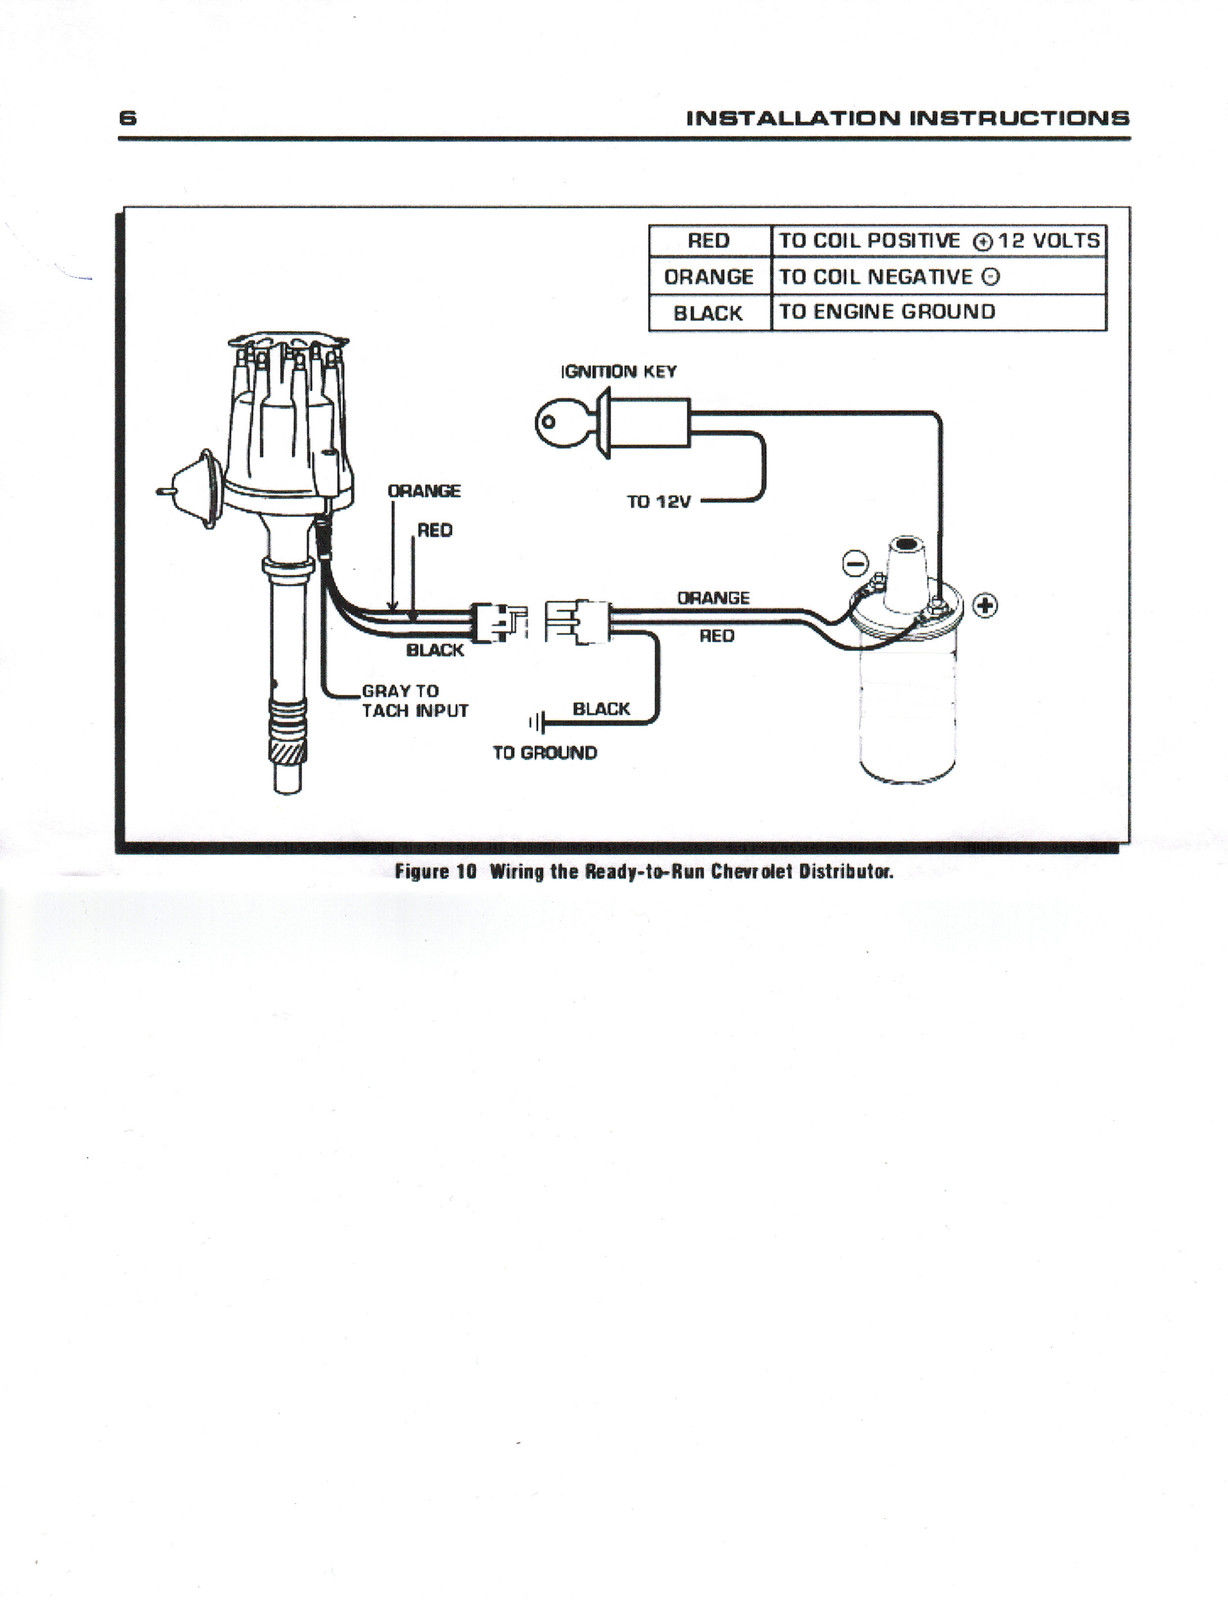 Chevy 350 Hei Spark Plug Wiring Diagram : chevy, spark, wiring, diagram, Chevrolet, Spark, Wiring, Diagram, Electrical